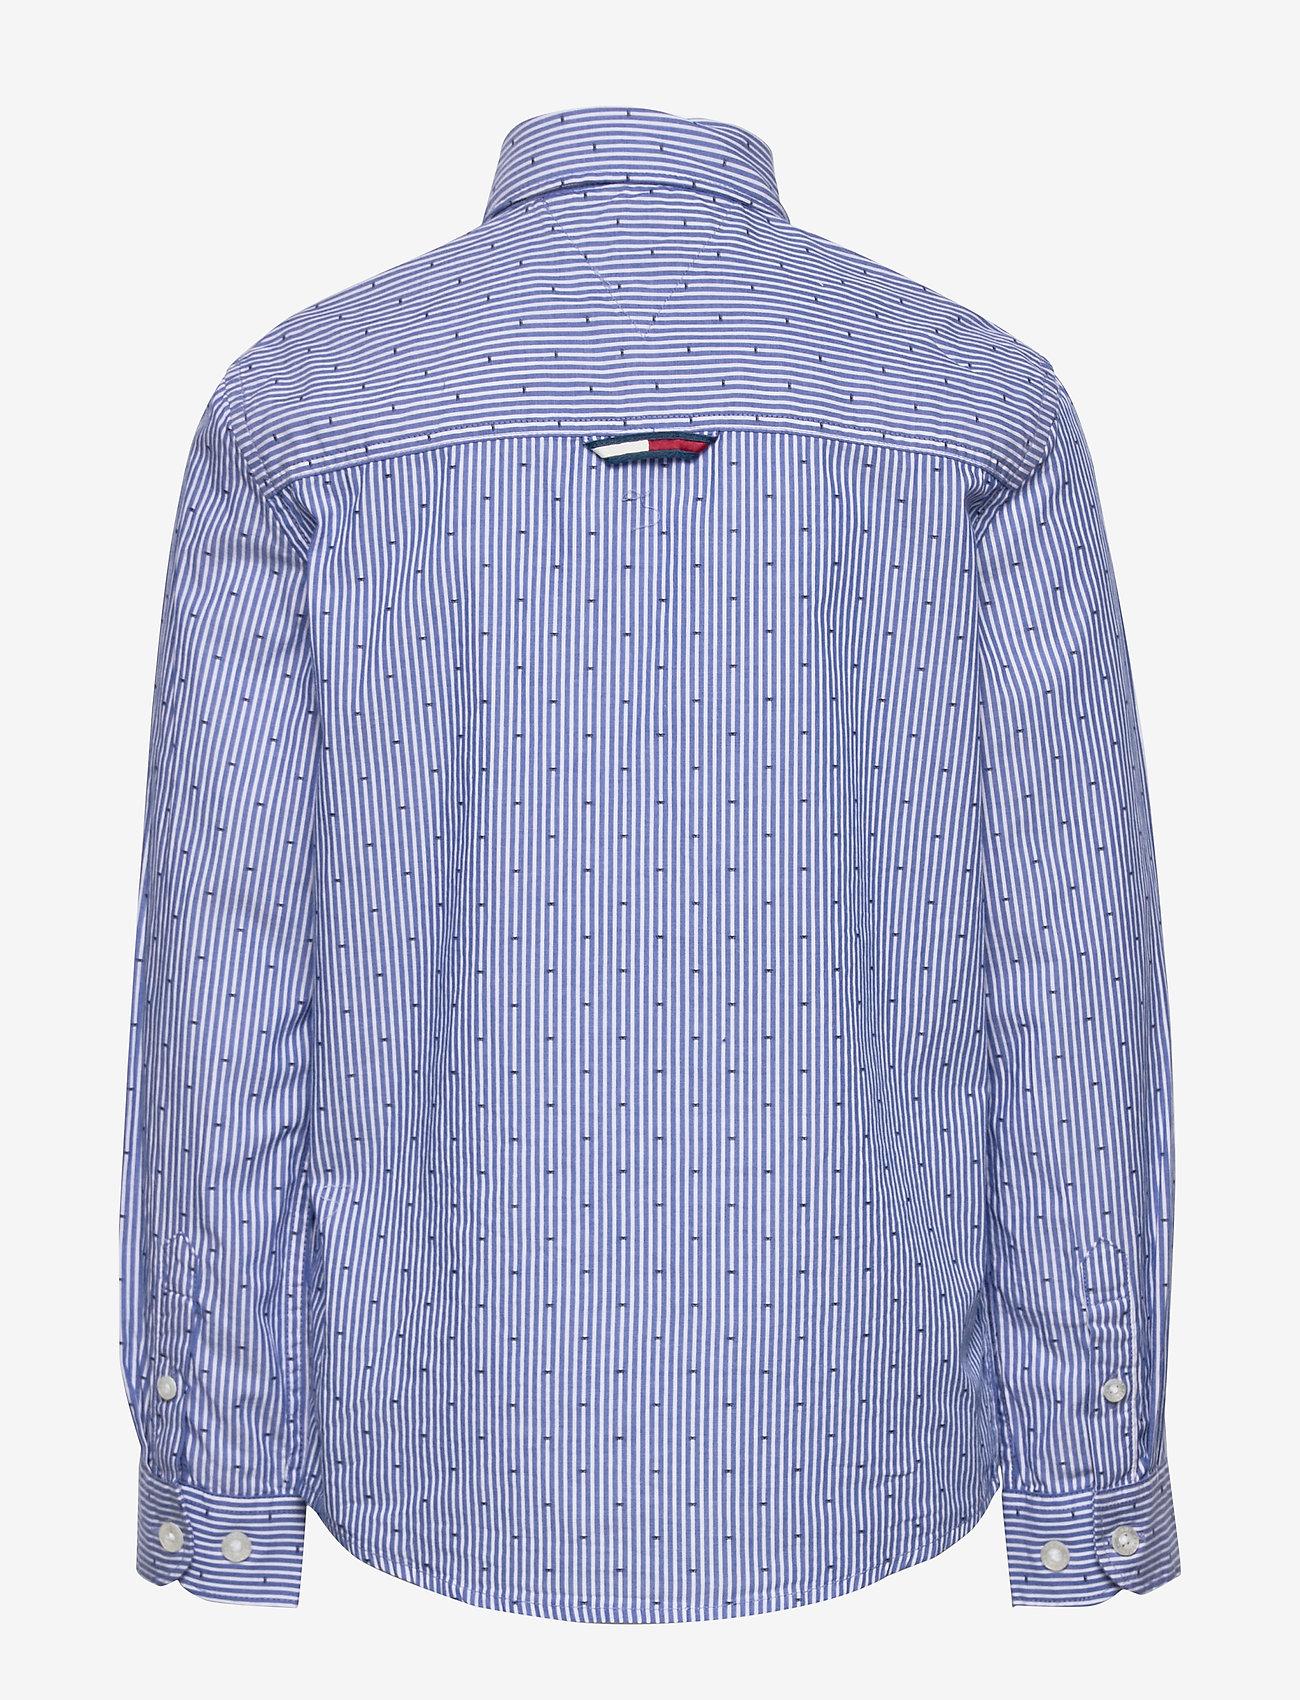 Tommy Hilfiger - YD STRIPE CLIPPING SHIRT L/S - shirts - blue stripe 02 - 1